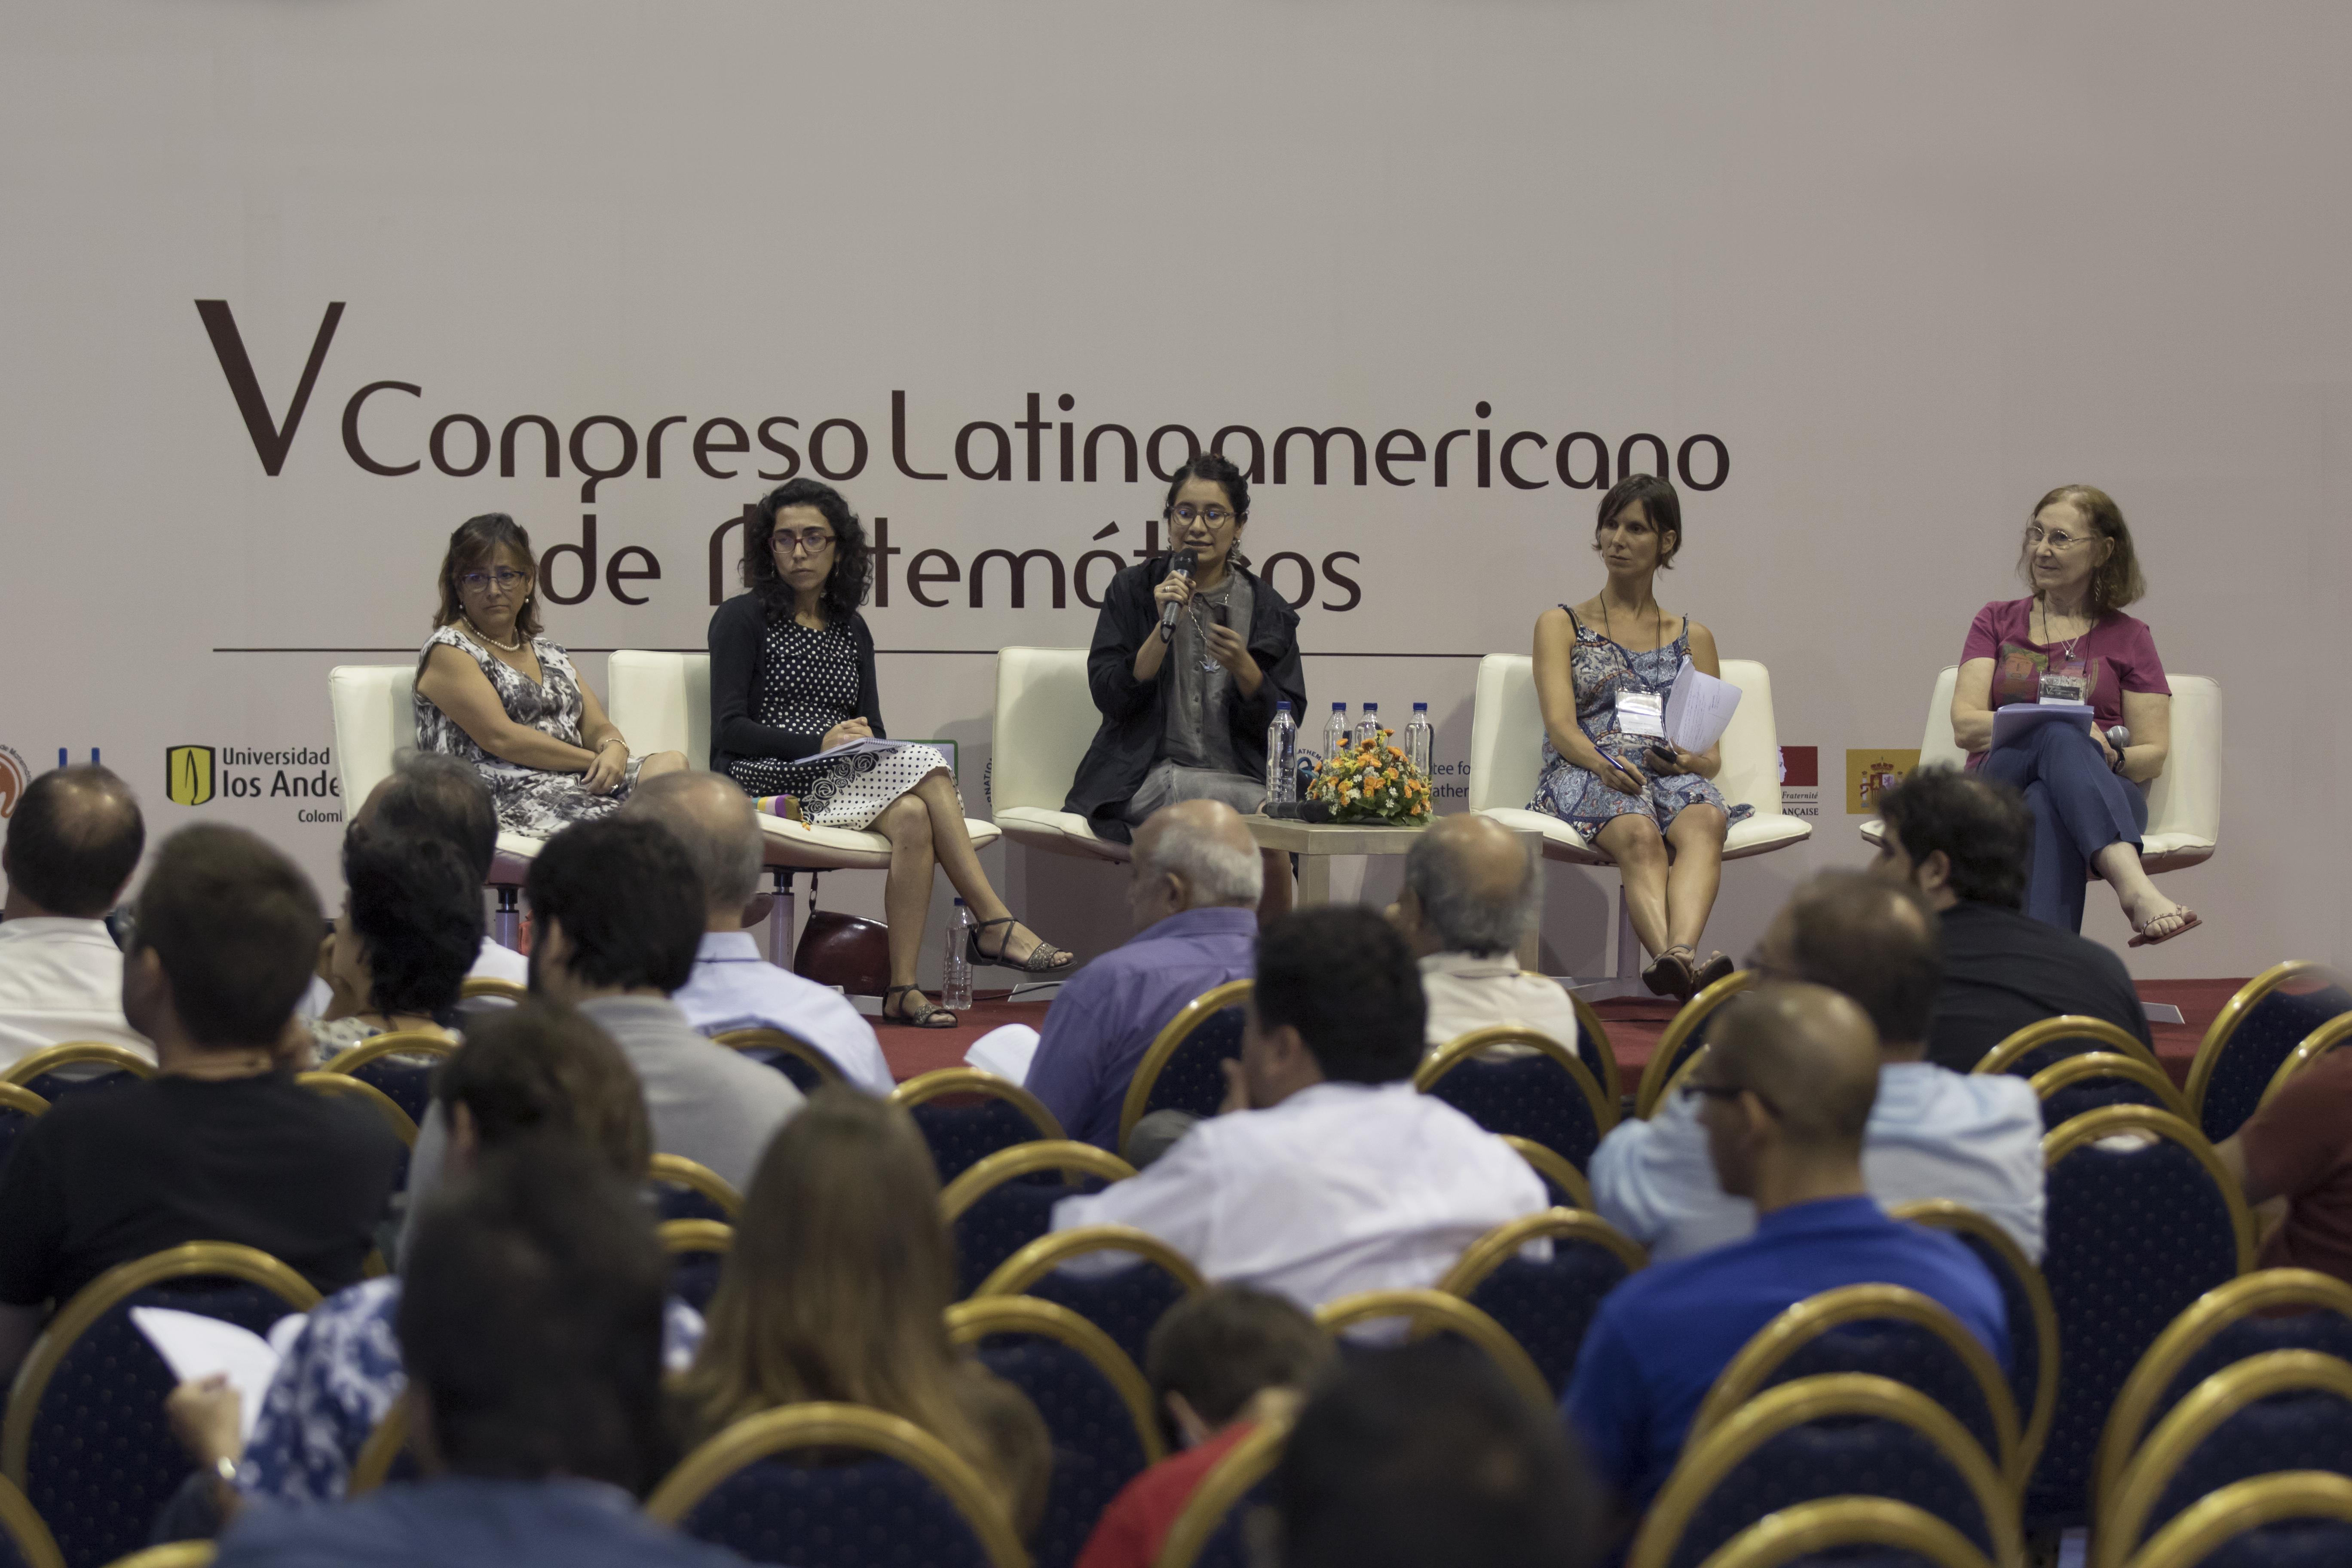 V Congreso Latinoamericano de Matemáticos